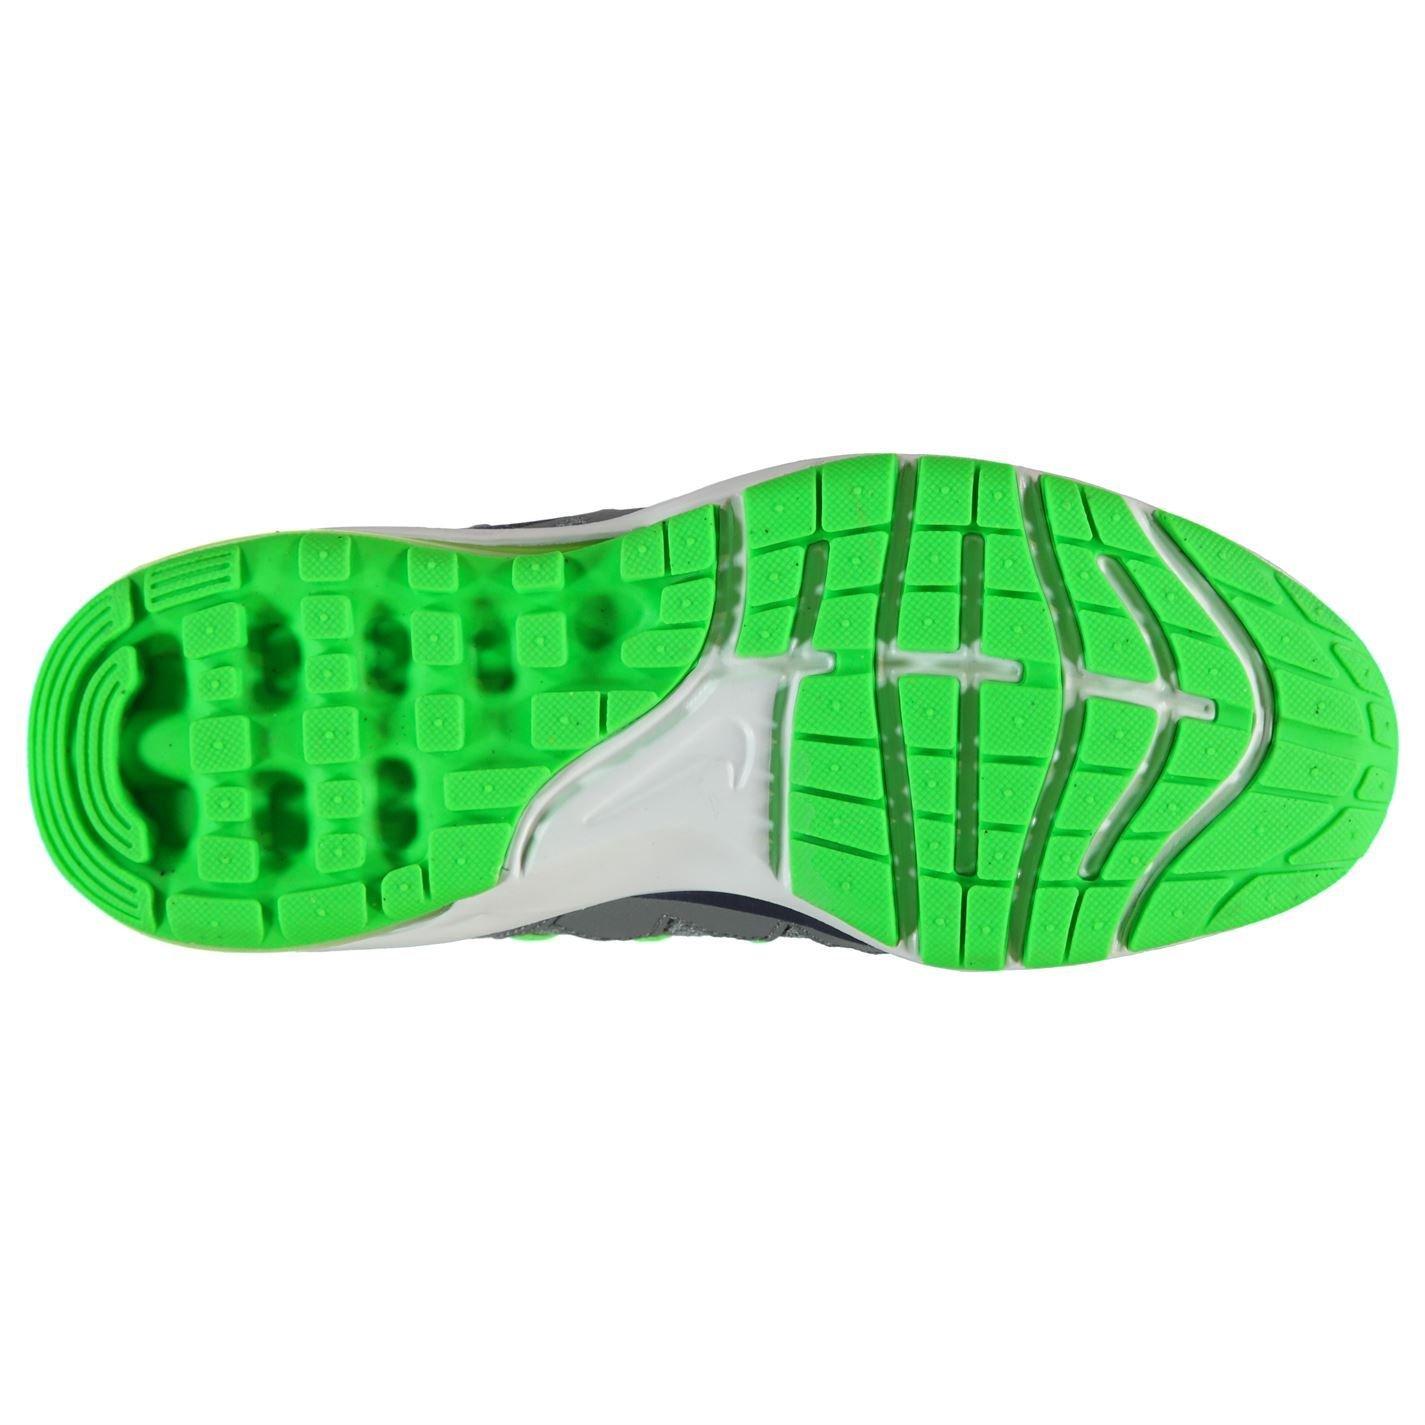 Nike Air Max Dynasty Training Schuhe Herren GrauGrün